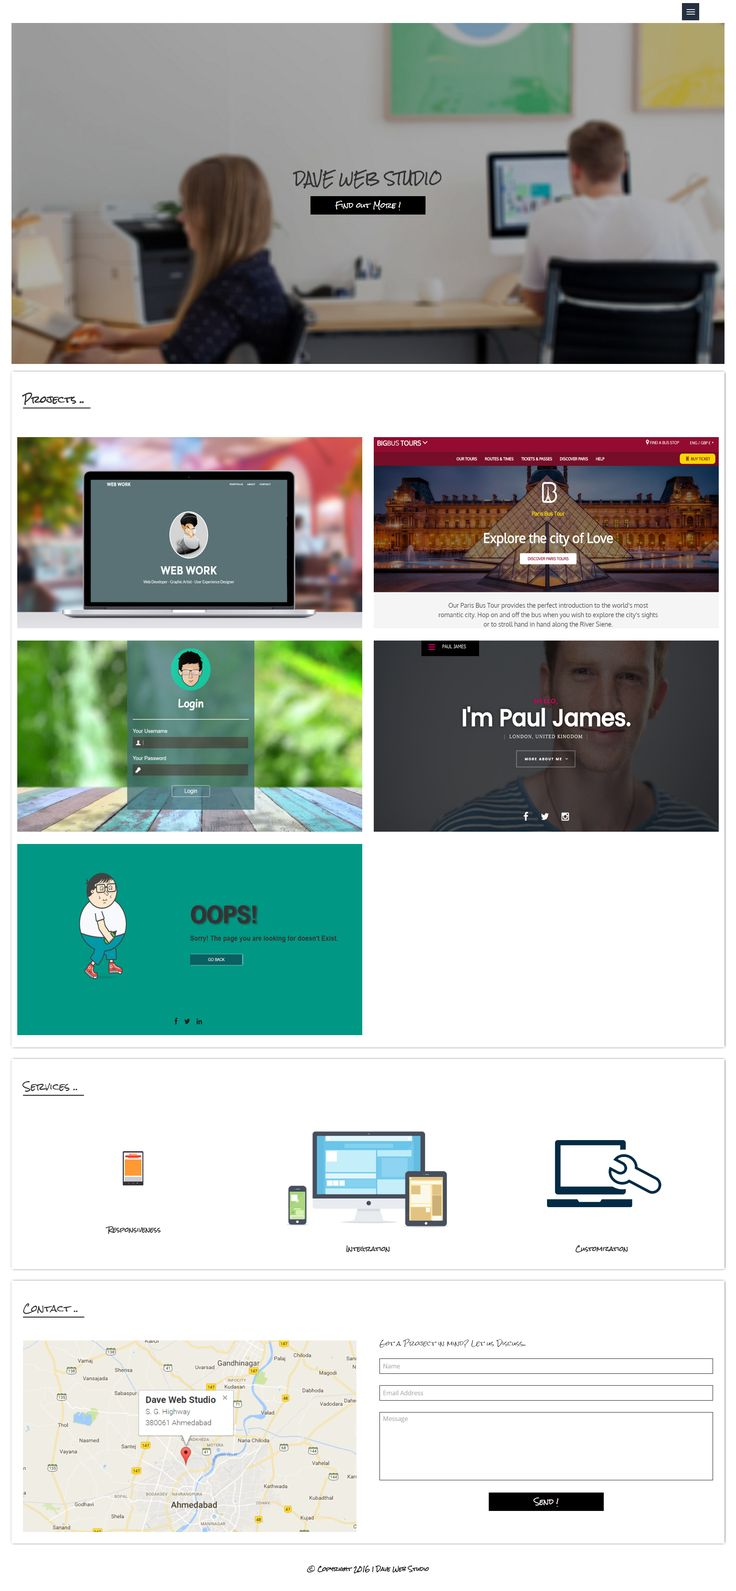 Dave Web Studio has an Portfolio for Website Development and Web Designing.